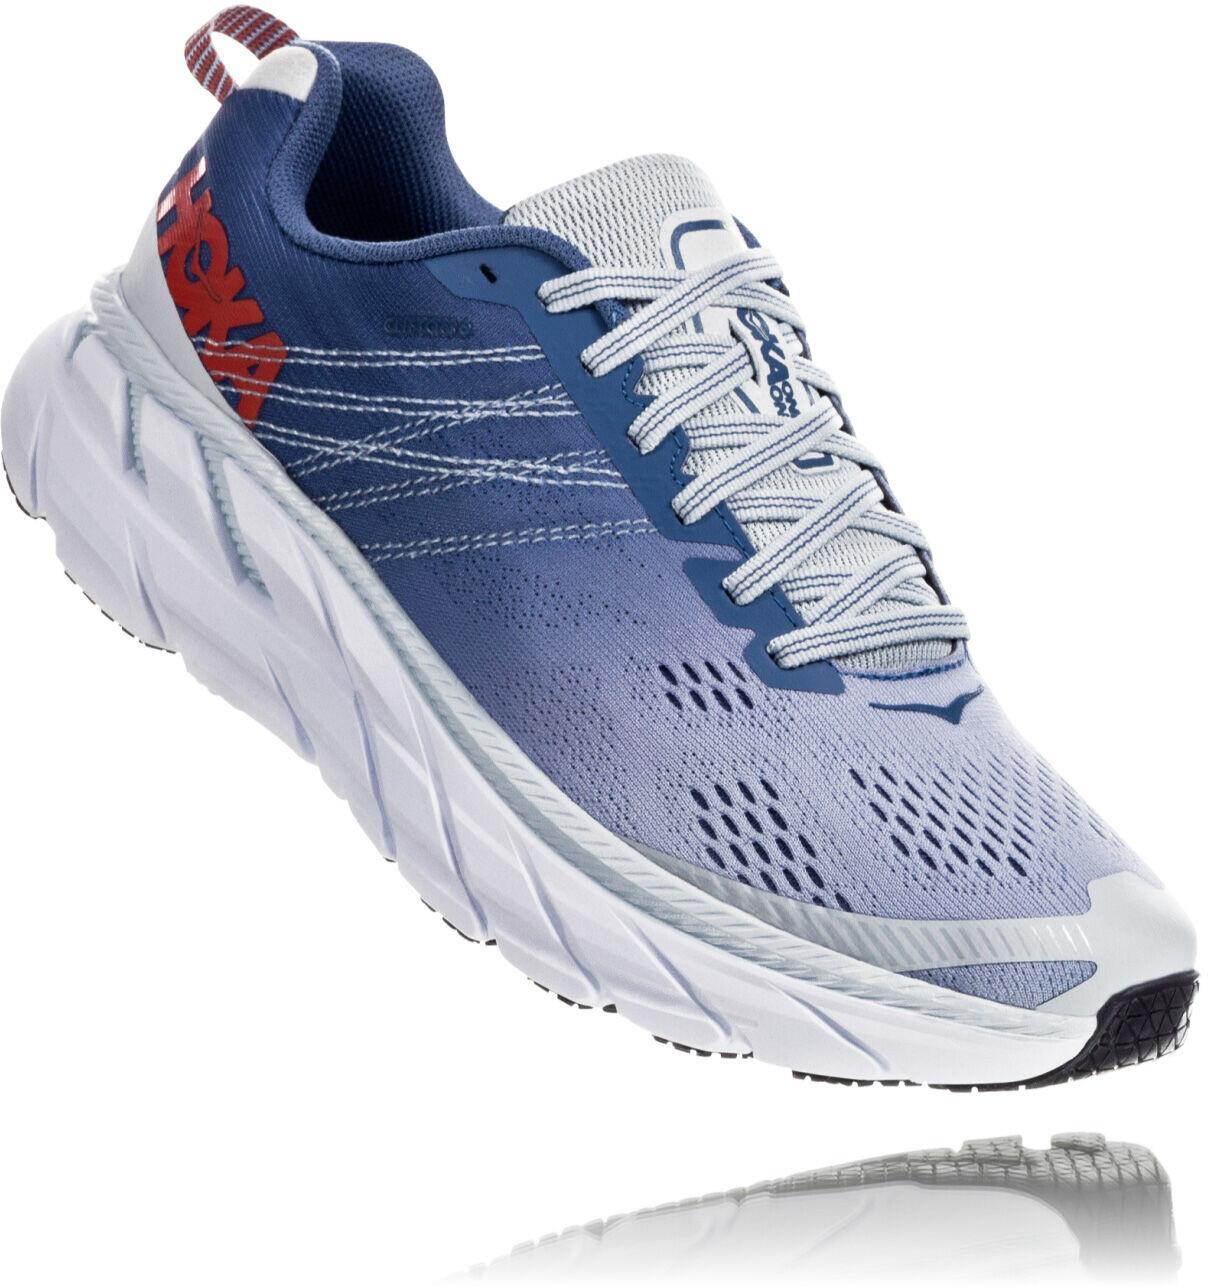 Hoka One One Clifton 6 Running Shoes Women plein airmoonlight blue